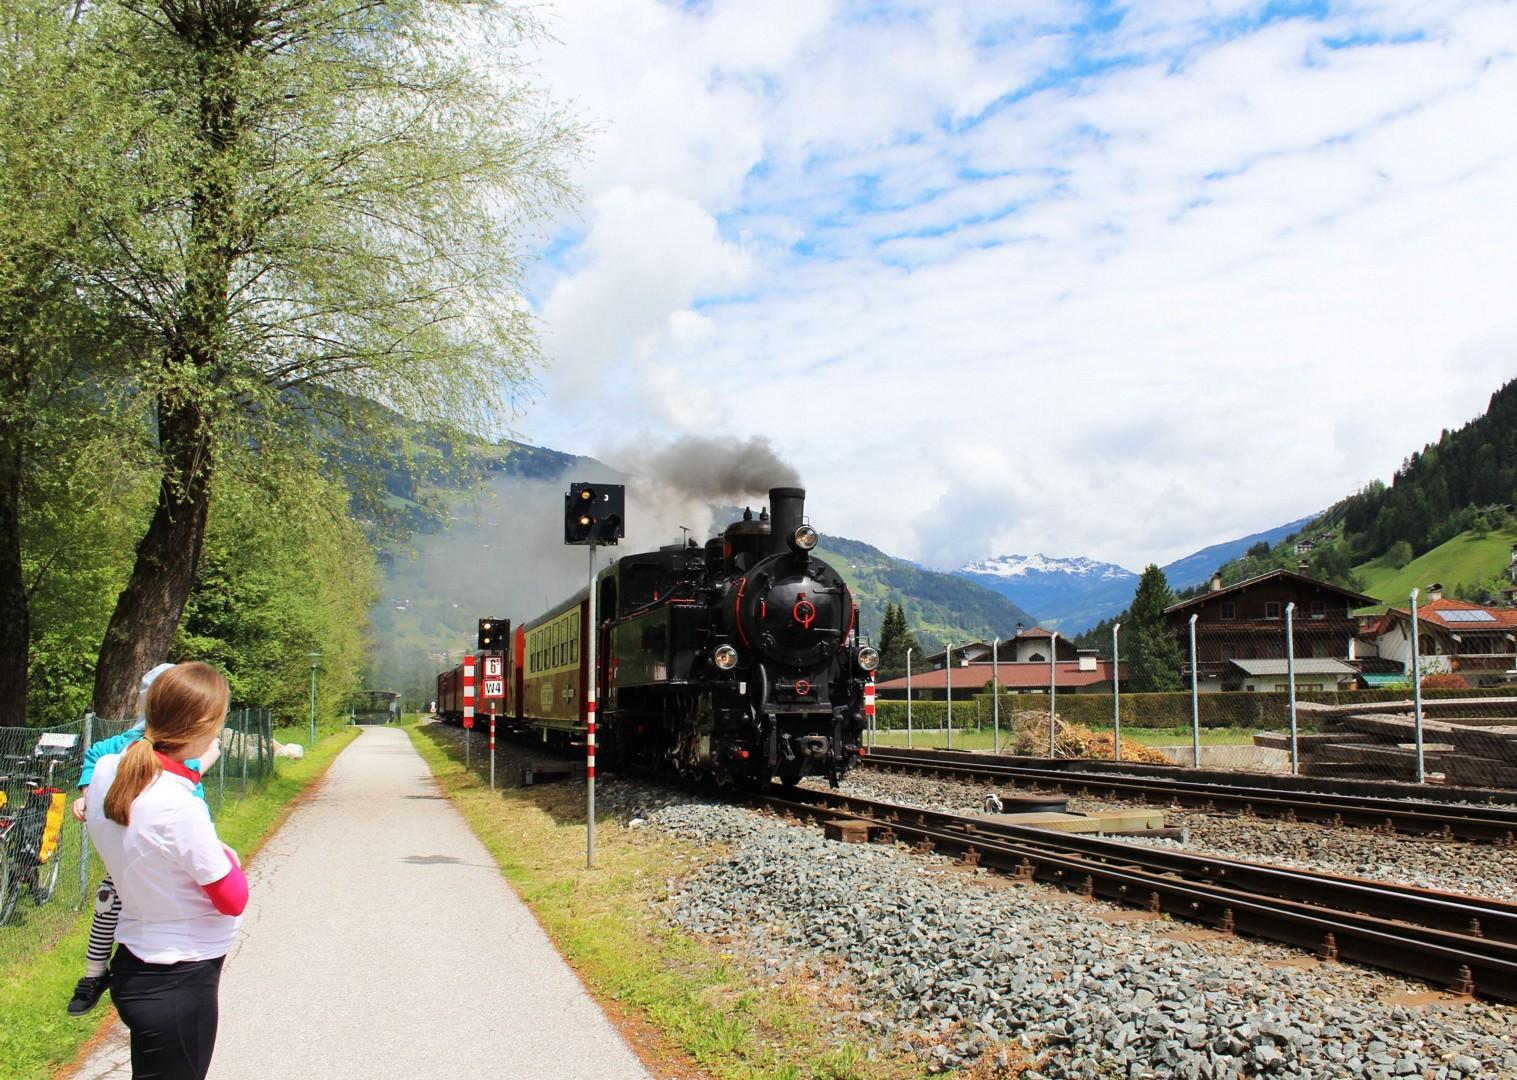 train-valleys-austria-cycling-holiday-self-guided.jpg - Austria - Tyrolean Valleys - Family Cycling